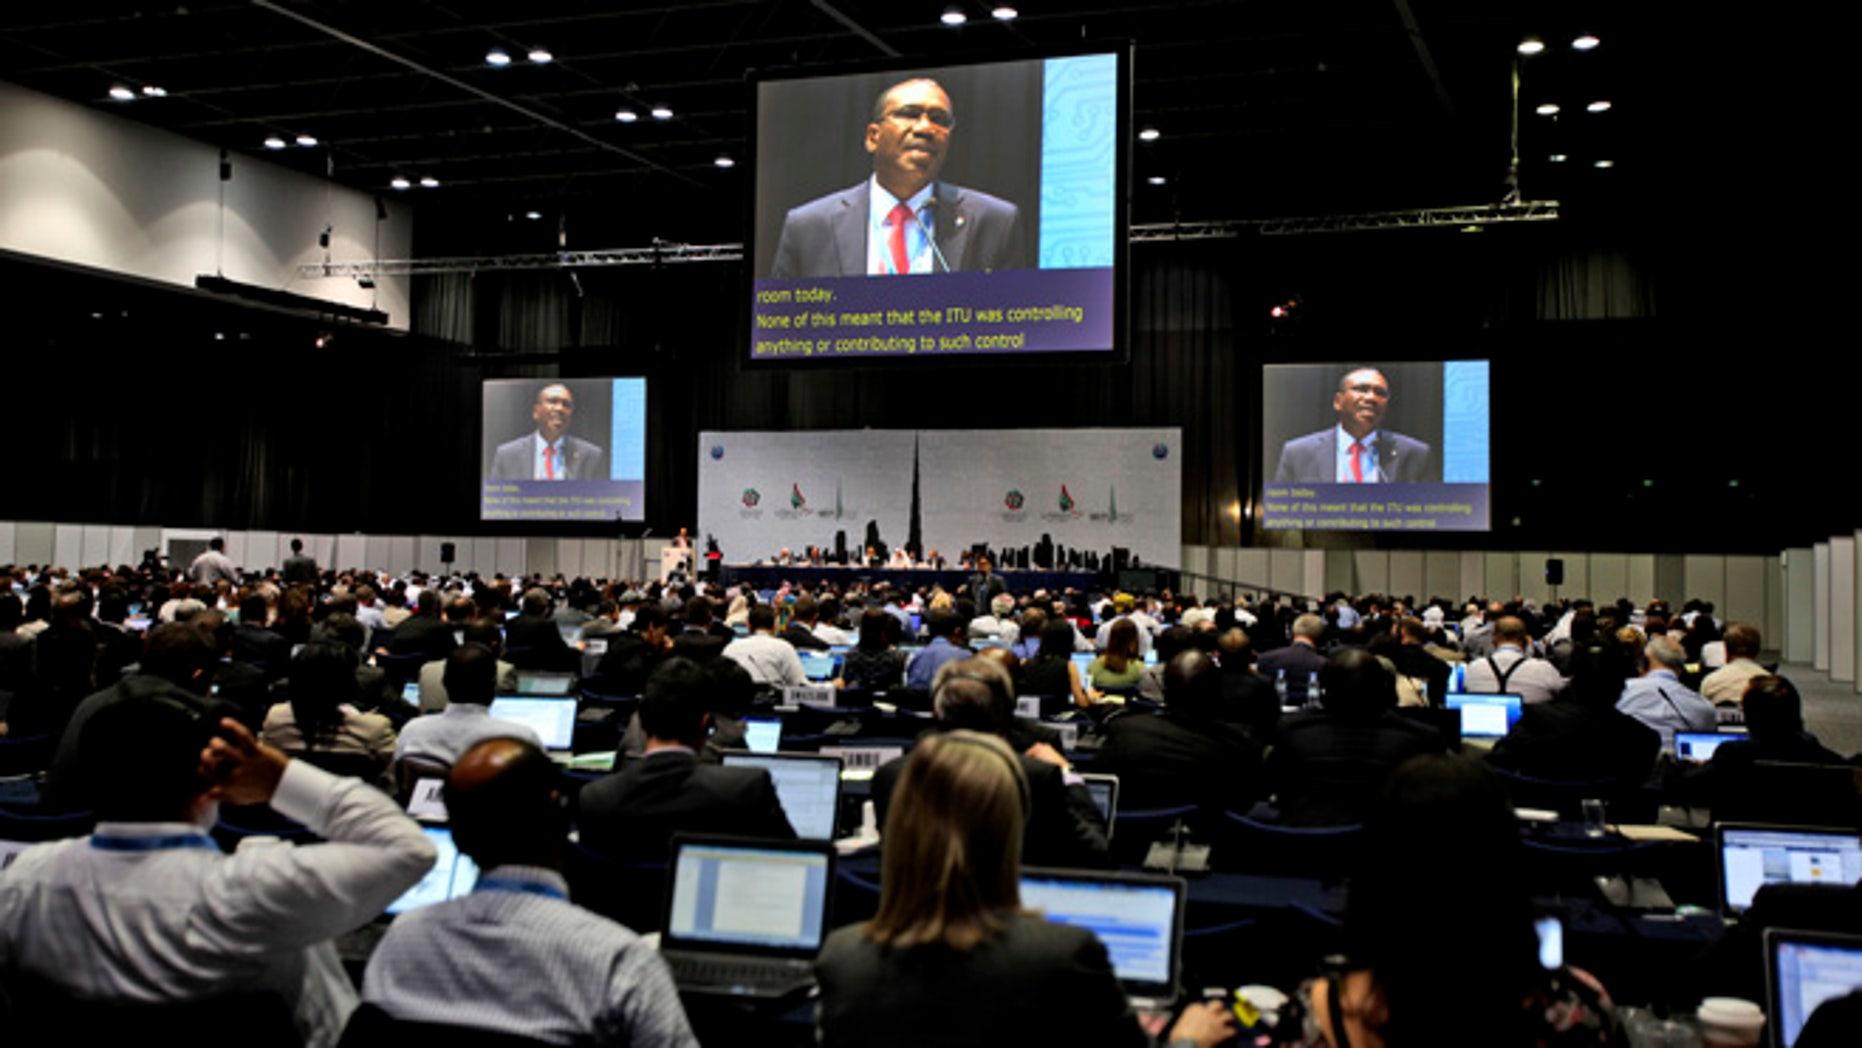 Participants listen to the speech of Hamdoun Toure, Secretary General of International Telecommunication Union, ITU, seen on screens, at the eleventh day of the World Conference on International Telecommunication in Dubai, United Arab Emirates, Monday Dec. 3, 2012.